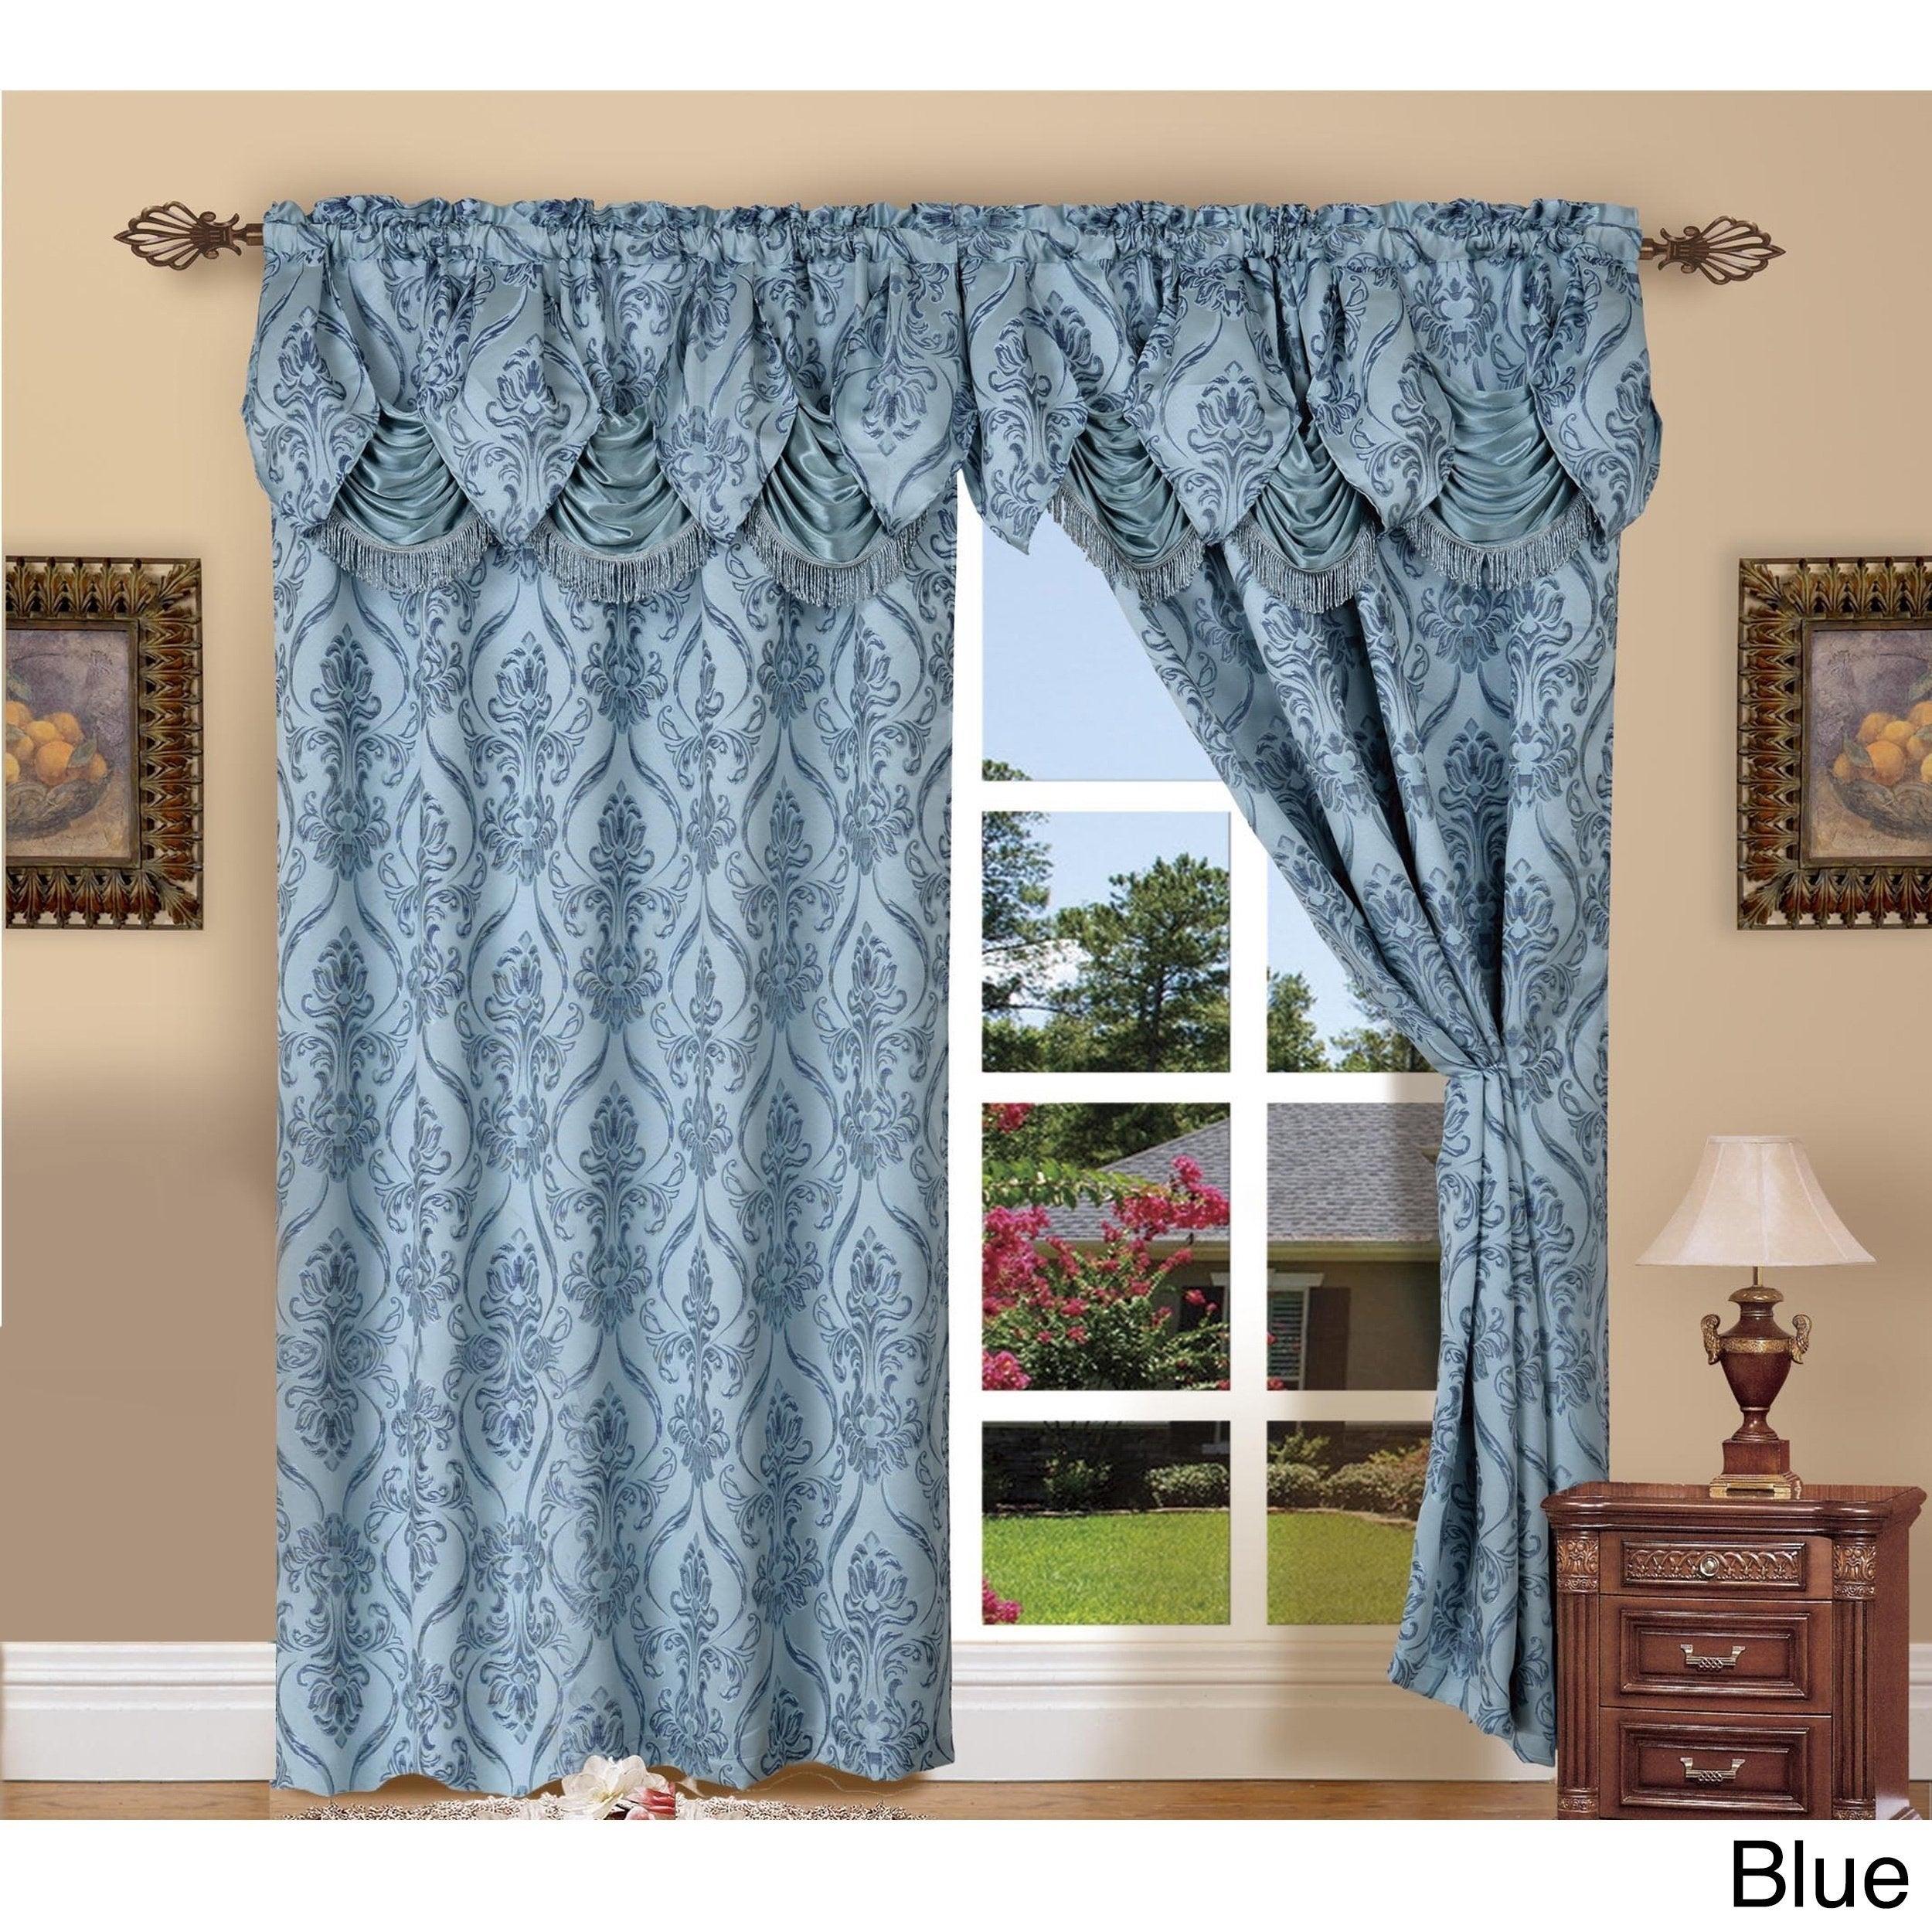 Elegant Comfort Luxury Penelopie Jacquard 84 Inch Length Window Curtain Panel Pair With Regard To Elegant Comfort Luxury Penelopie Jacquard Window Curtain Panel Pairs (View 3 of 20)